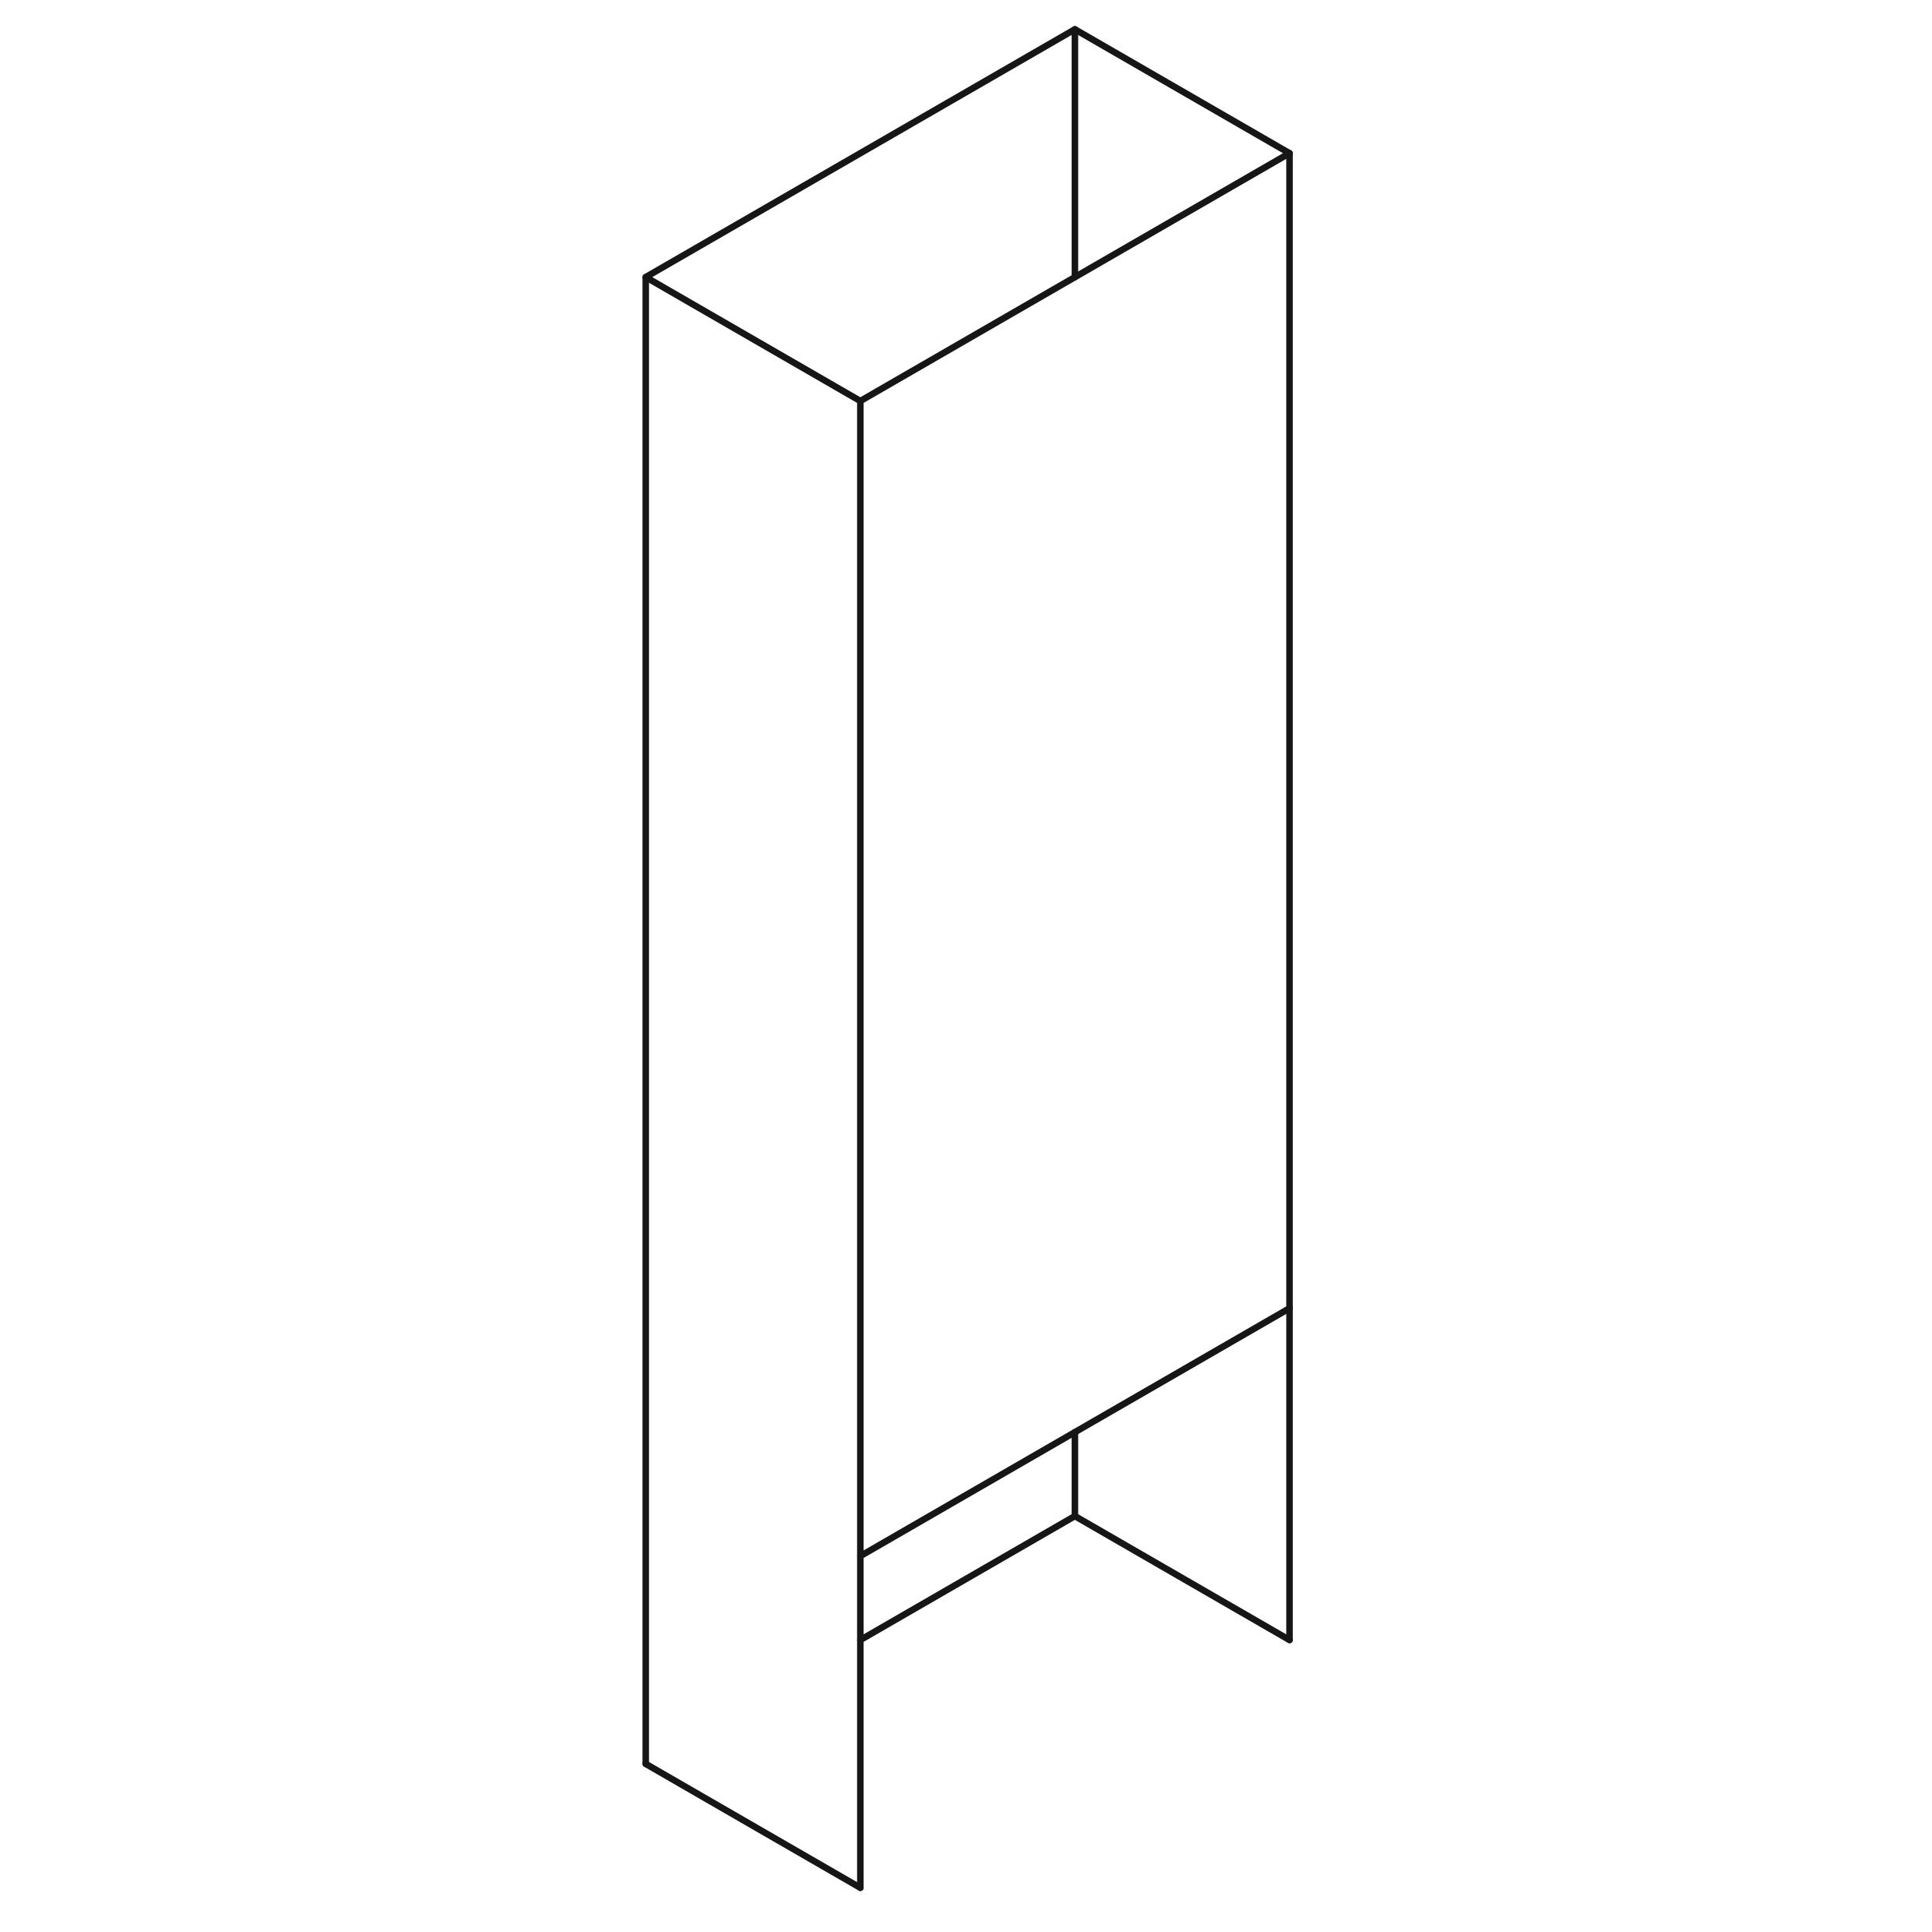 Kirkyl_Style_1_3D_WEB.jpg